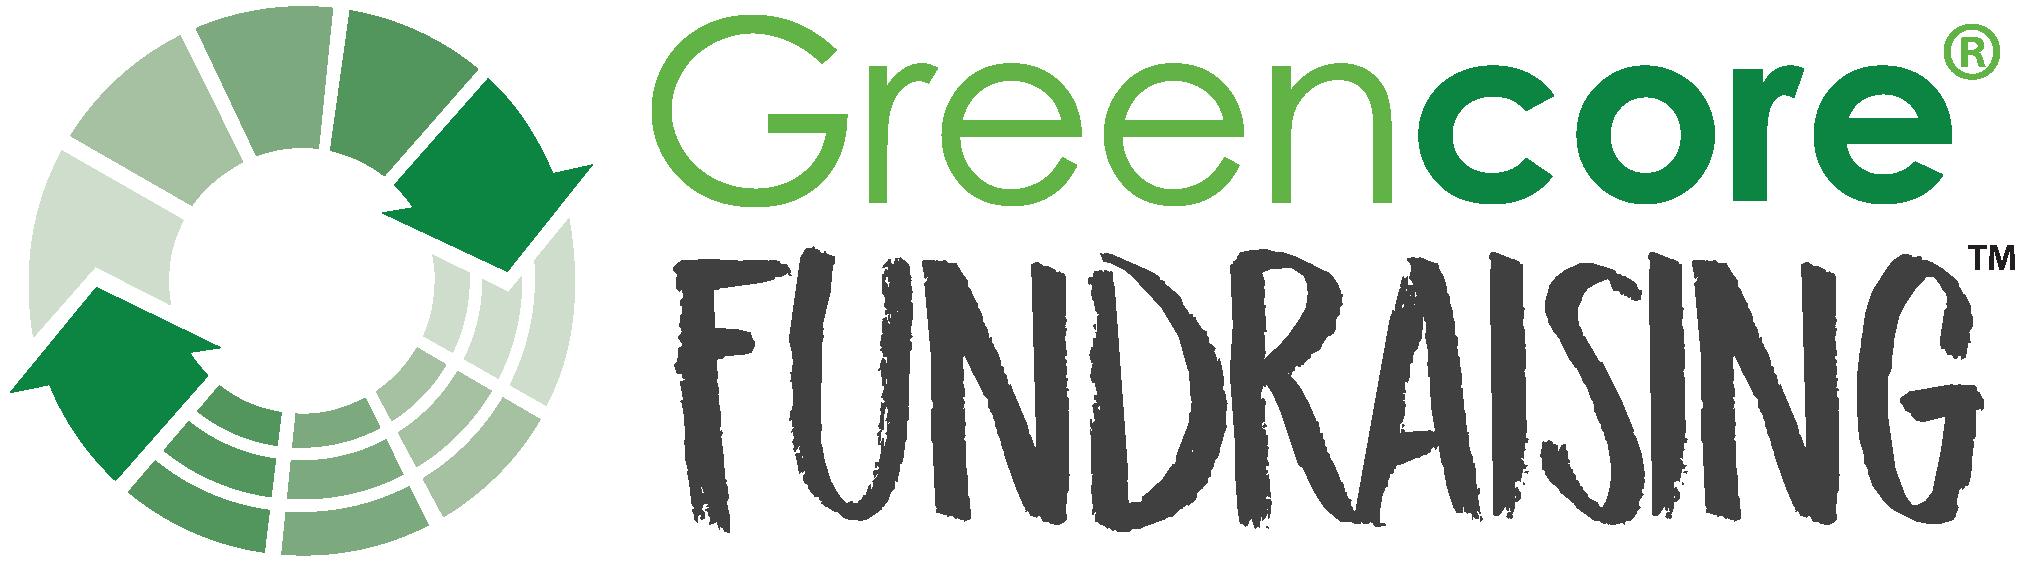 Greencore Fundraising